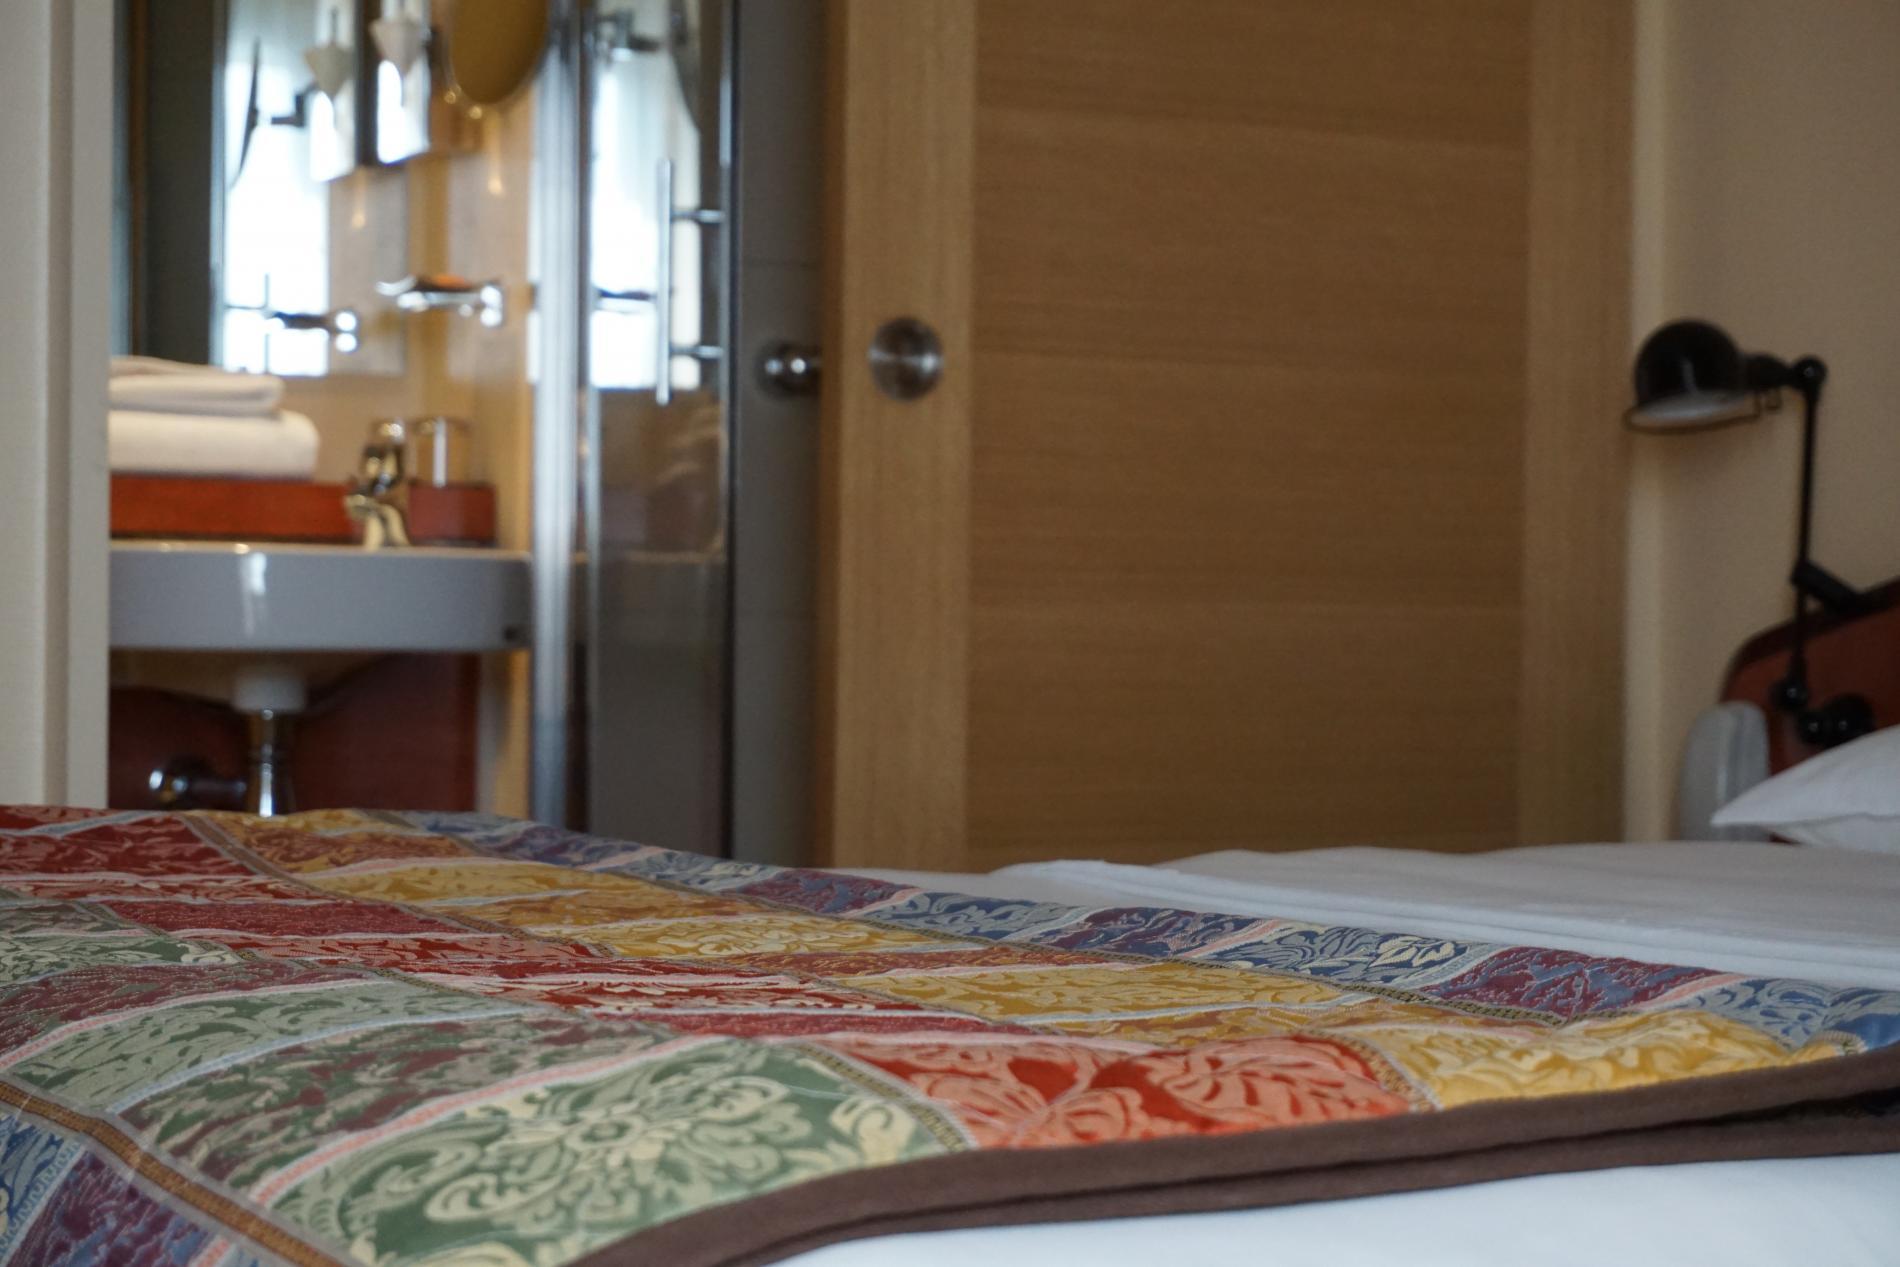 chambres royal h tel caen centre. Black Bedroom Furniture Sets. Home Design Ideas